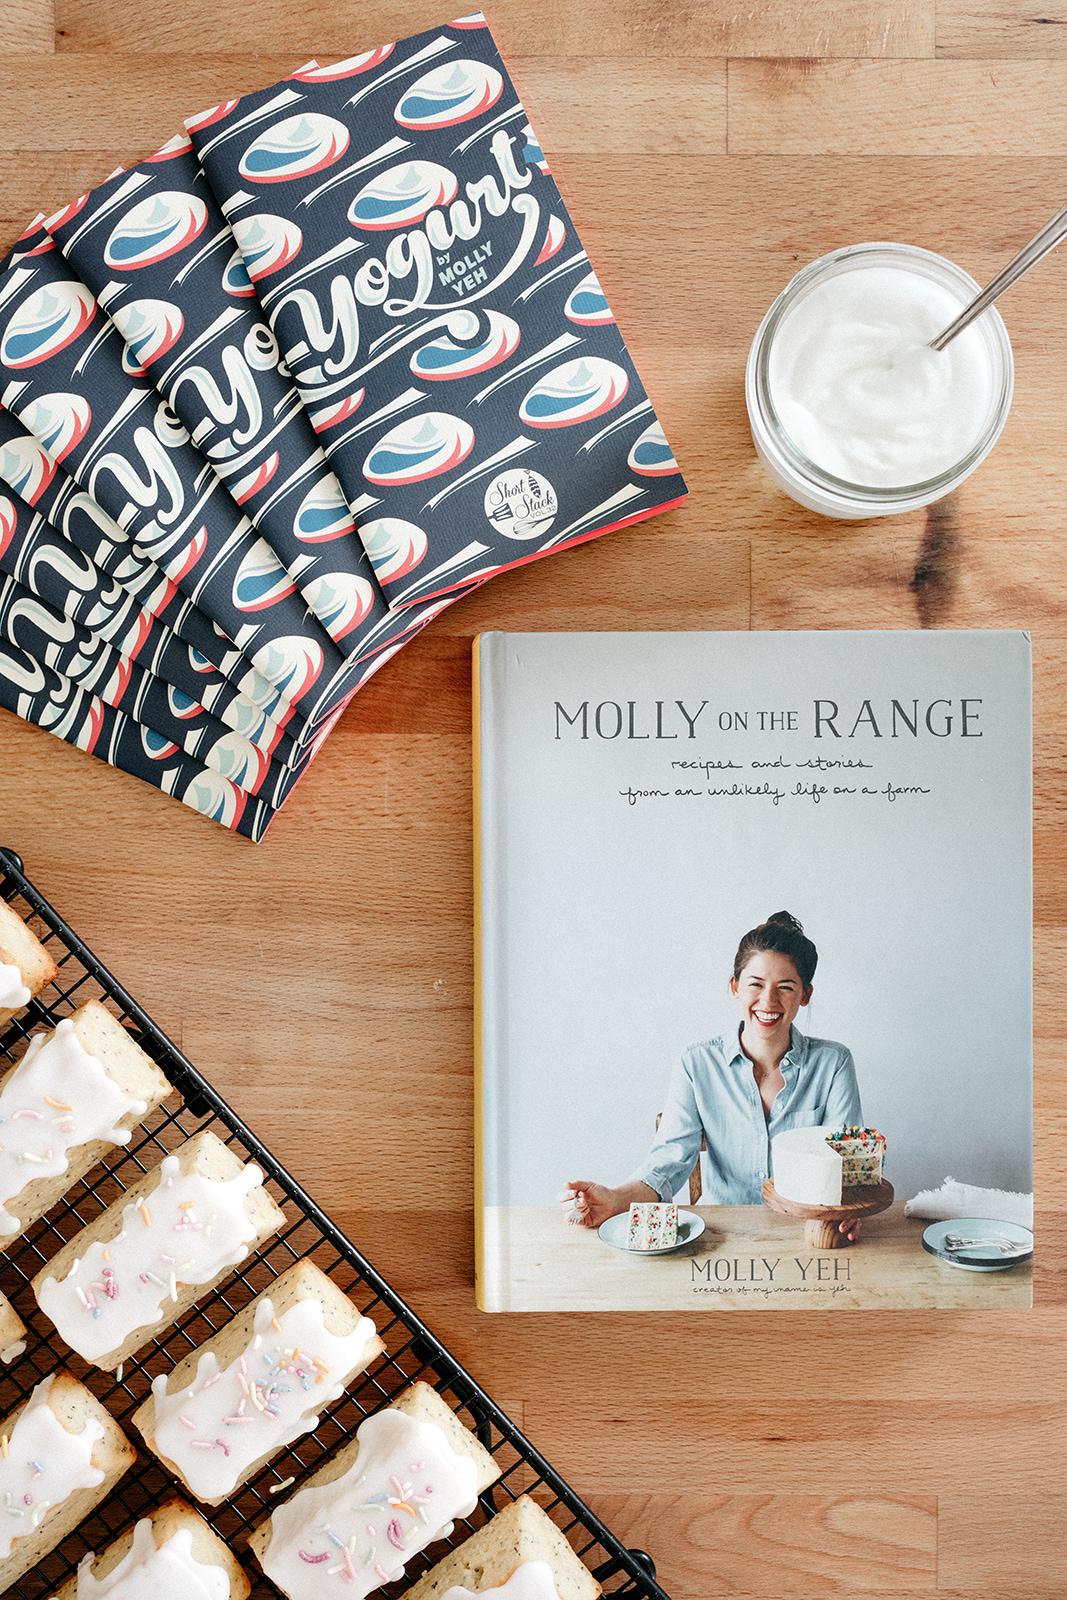 mollyyeh-yogurt-book-19.jpg